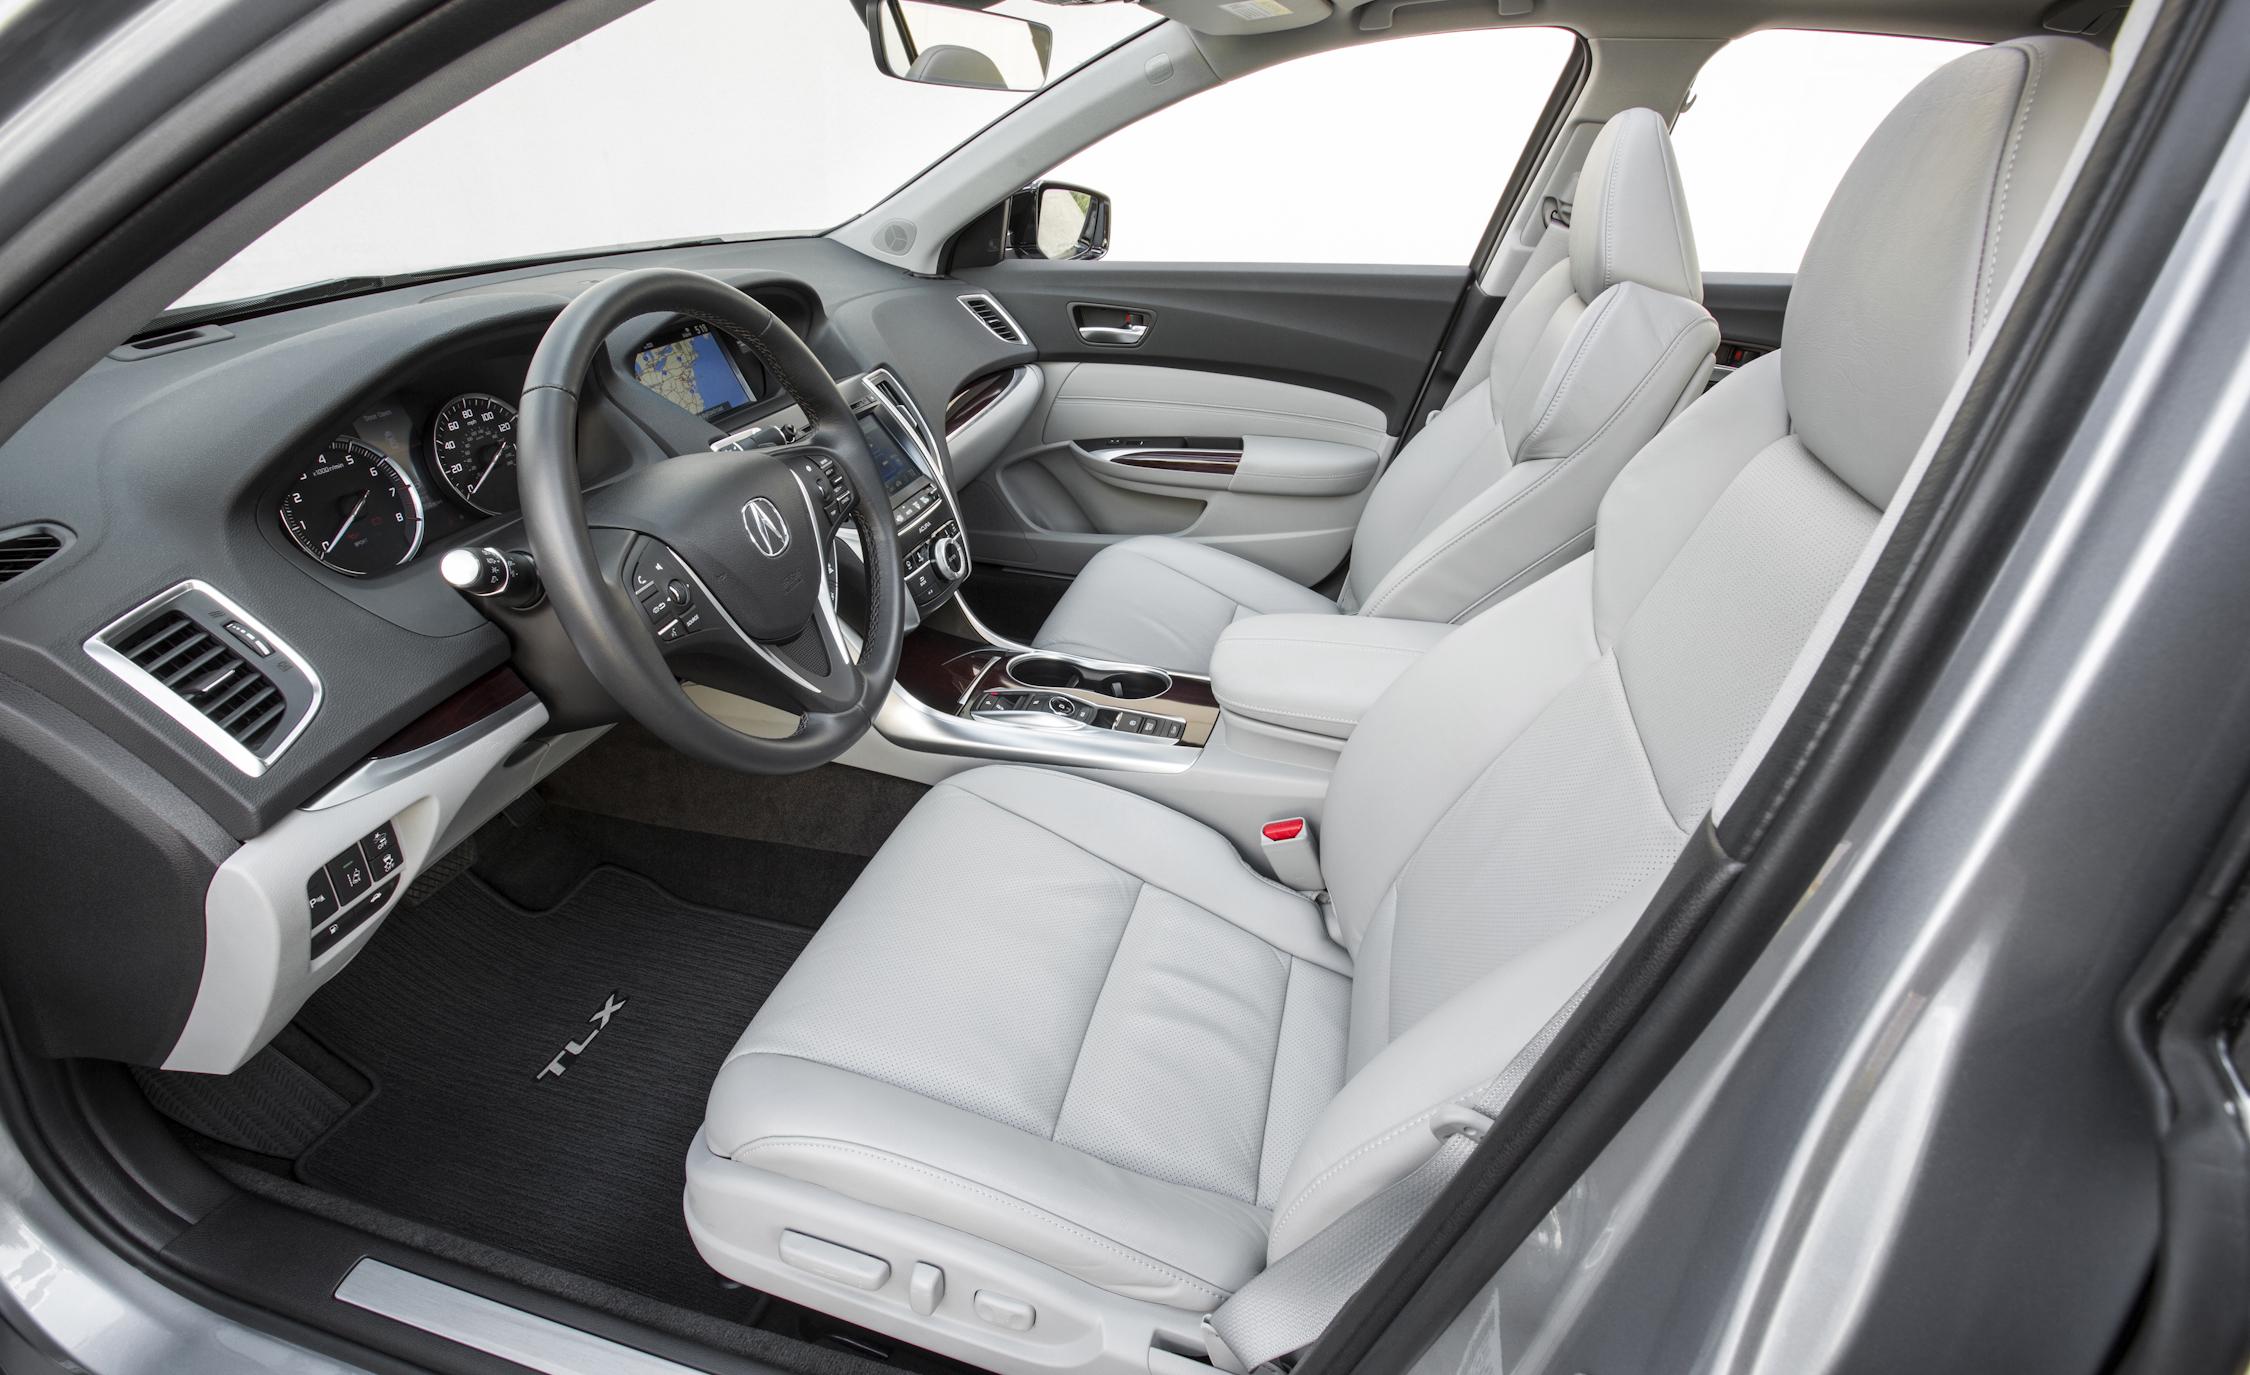 2015 Acura TLX 3.5L SH-AWD Interior Front Seats